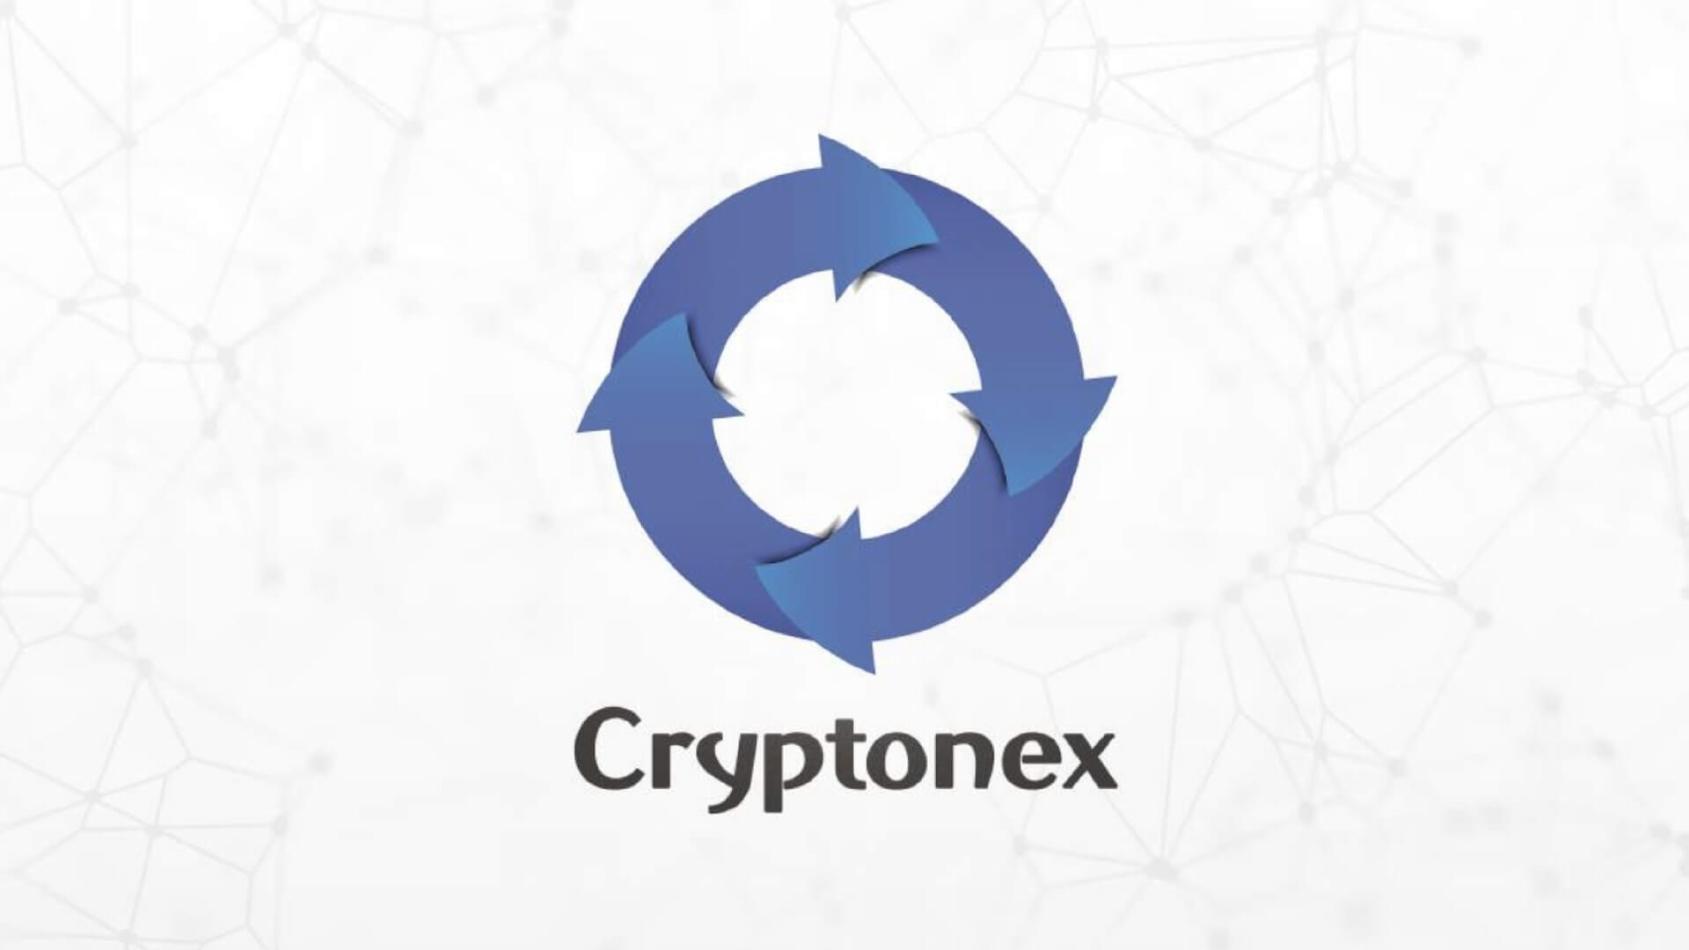 TheMerkle Cryptonex